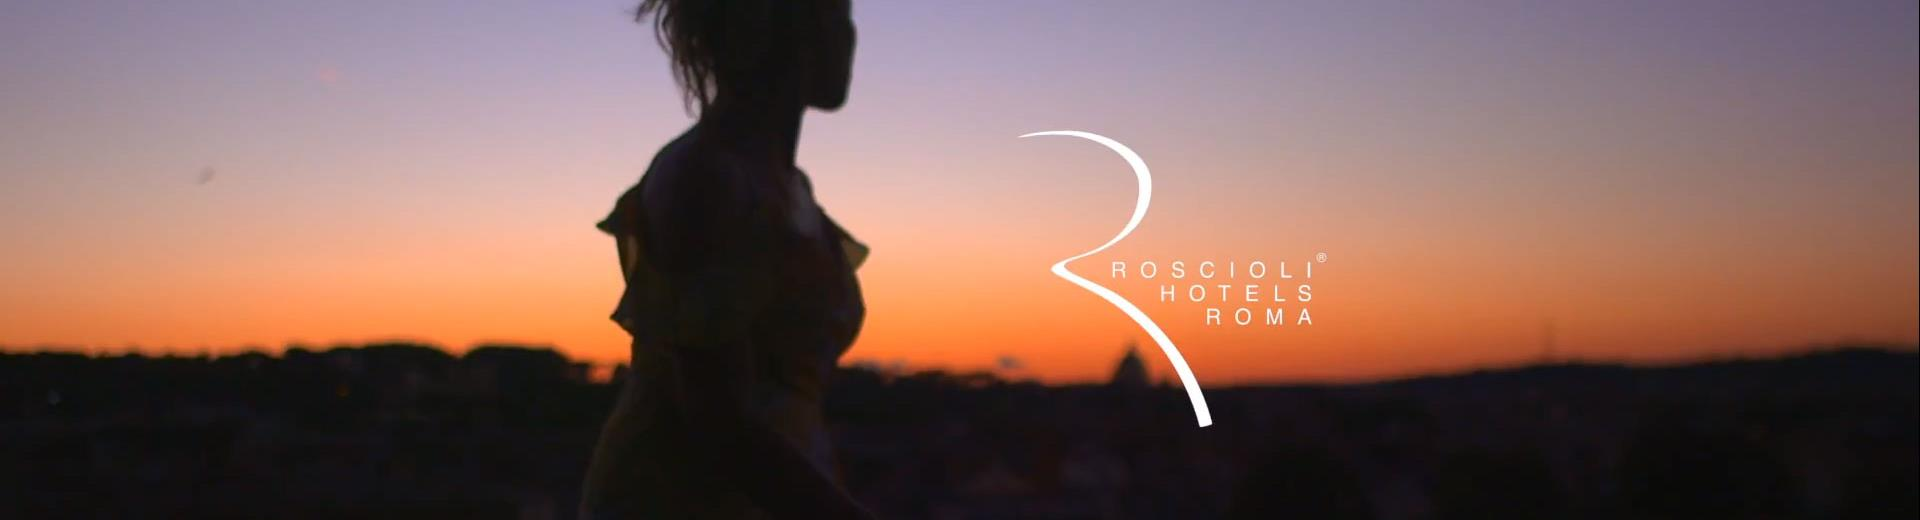 Roscioli Hotel Roma